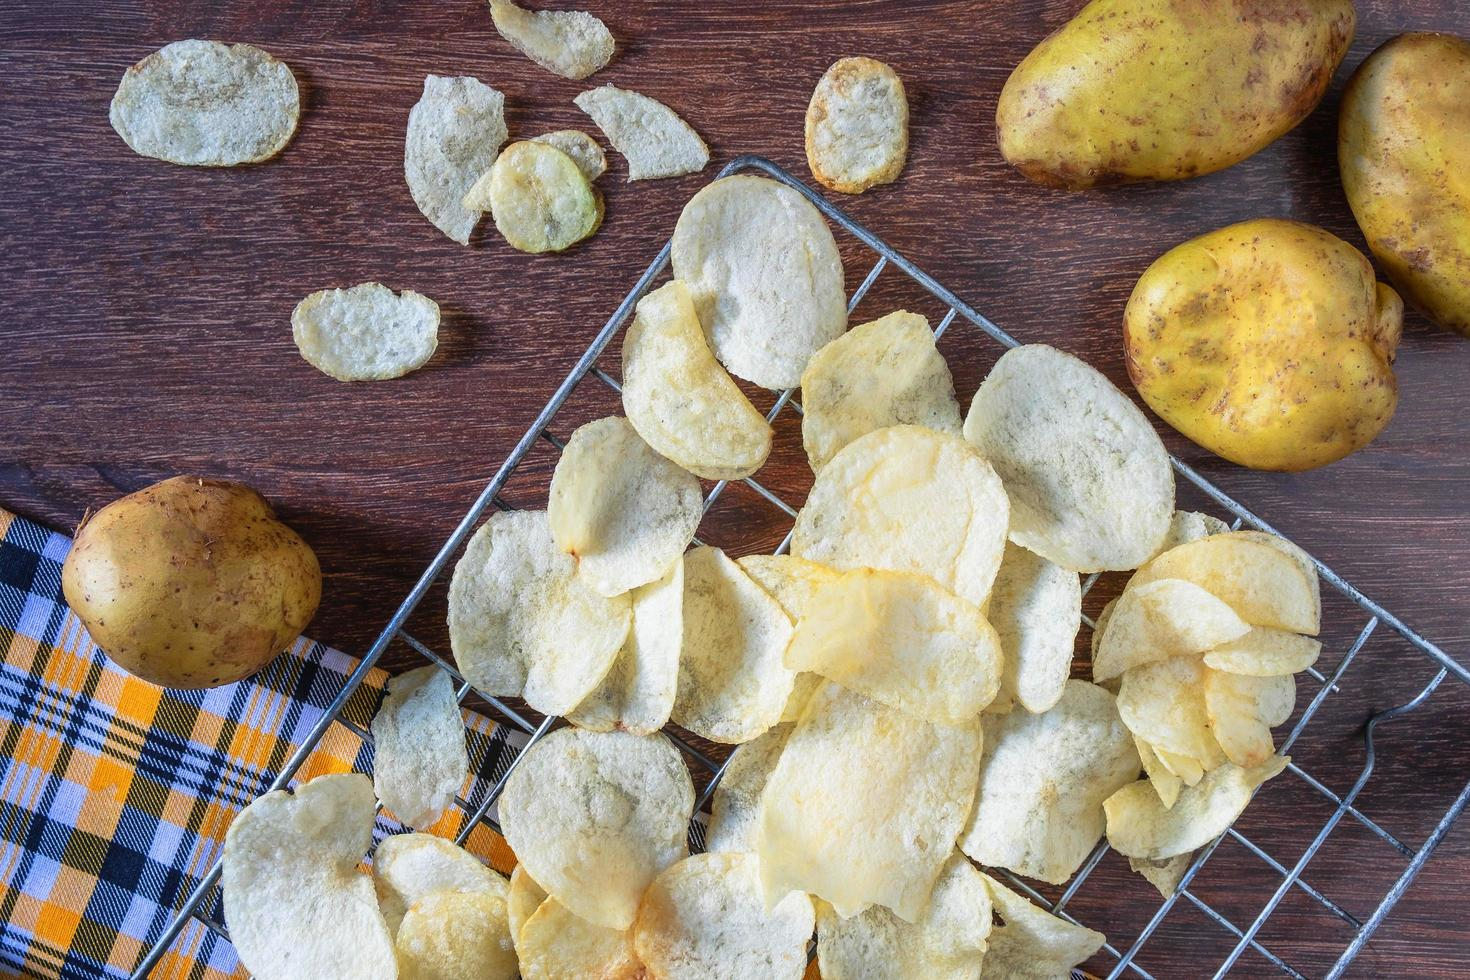 Some fresh fried potato chips photo